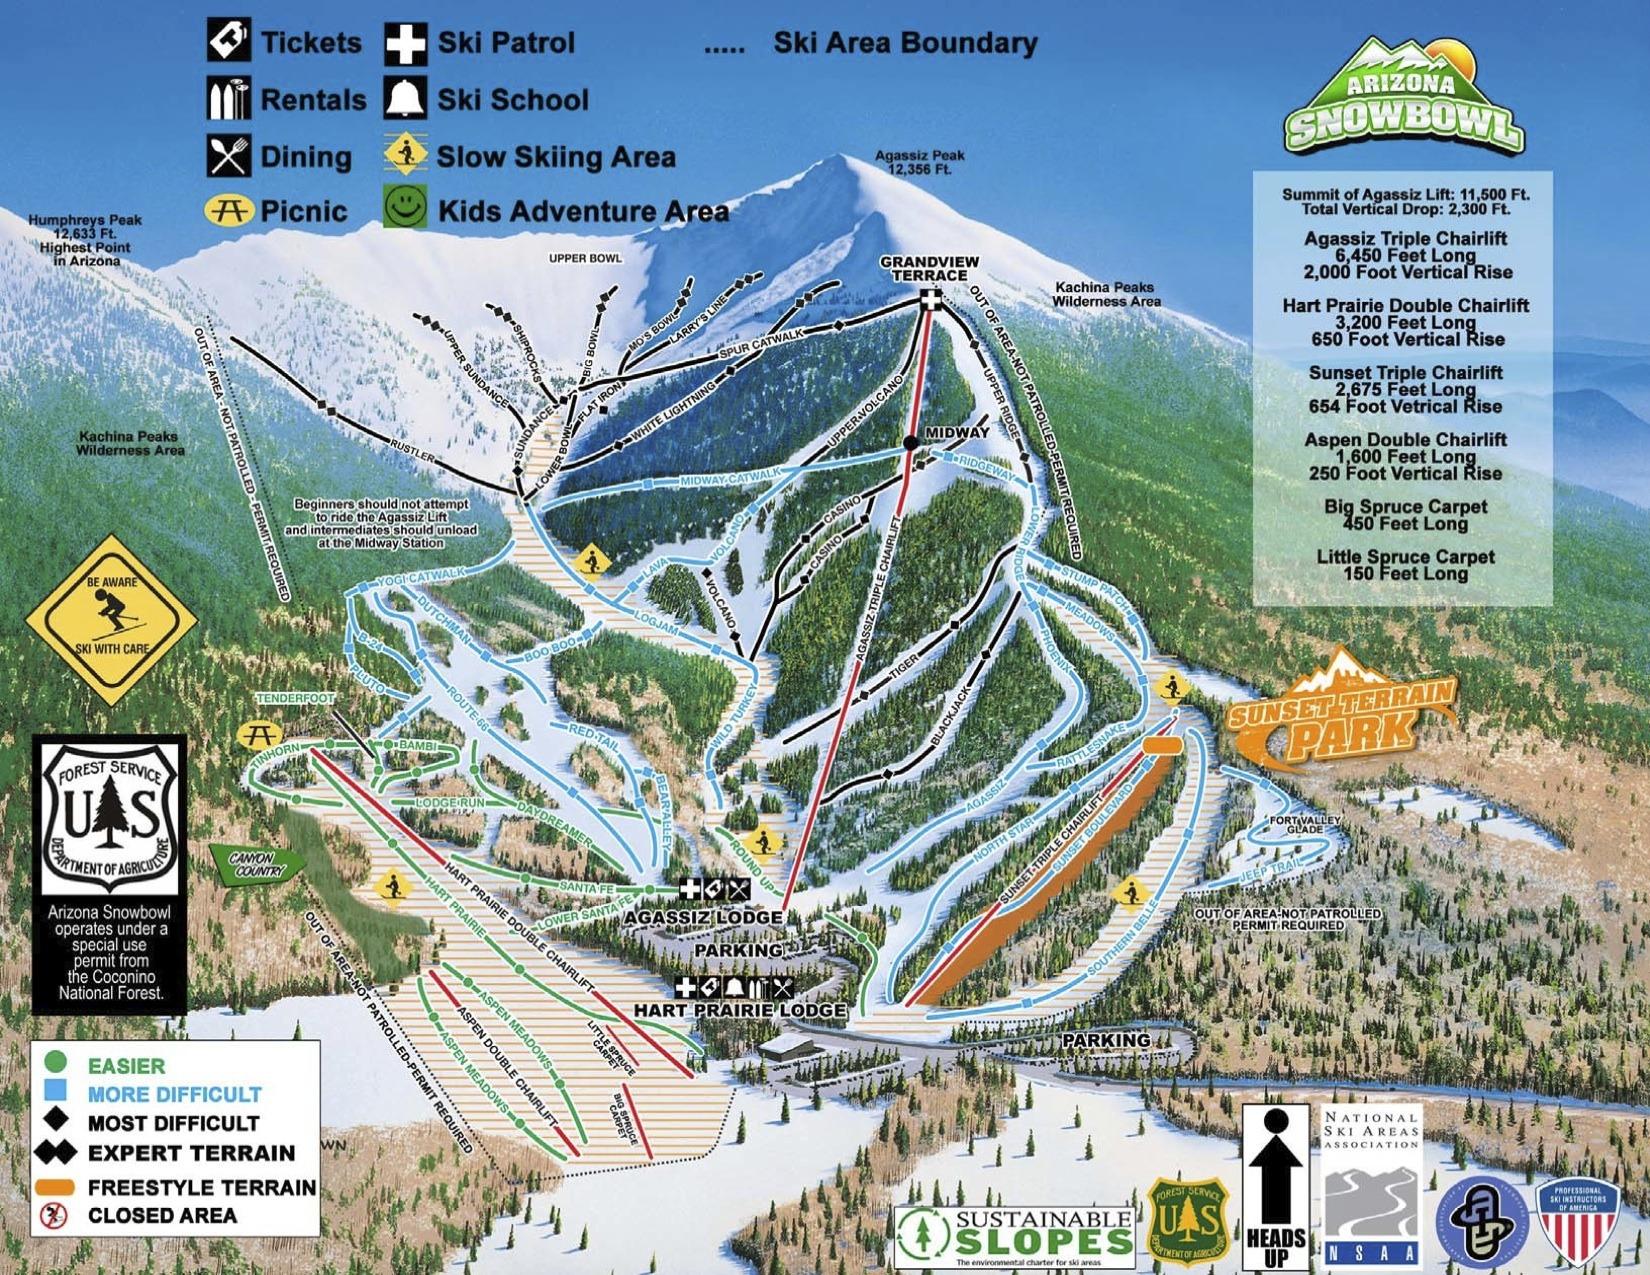 Arizona Snowbowl Map